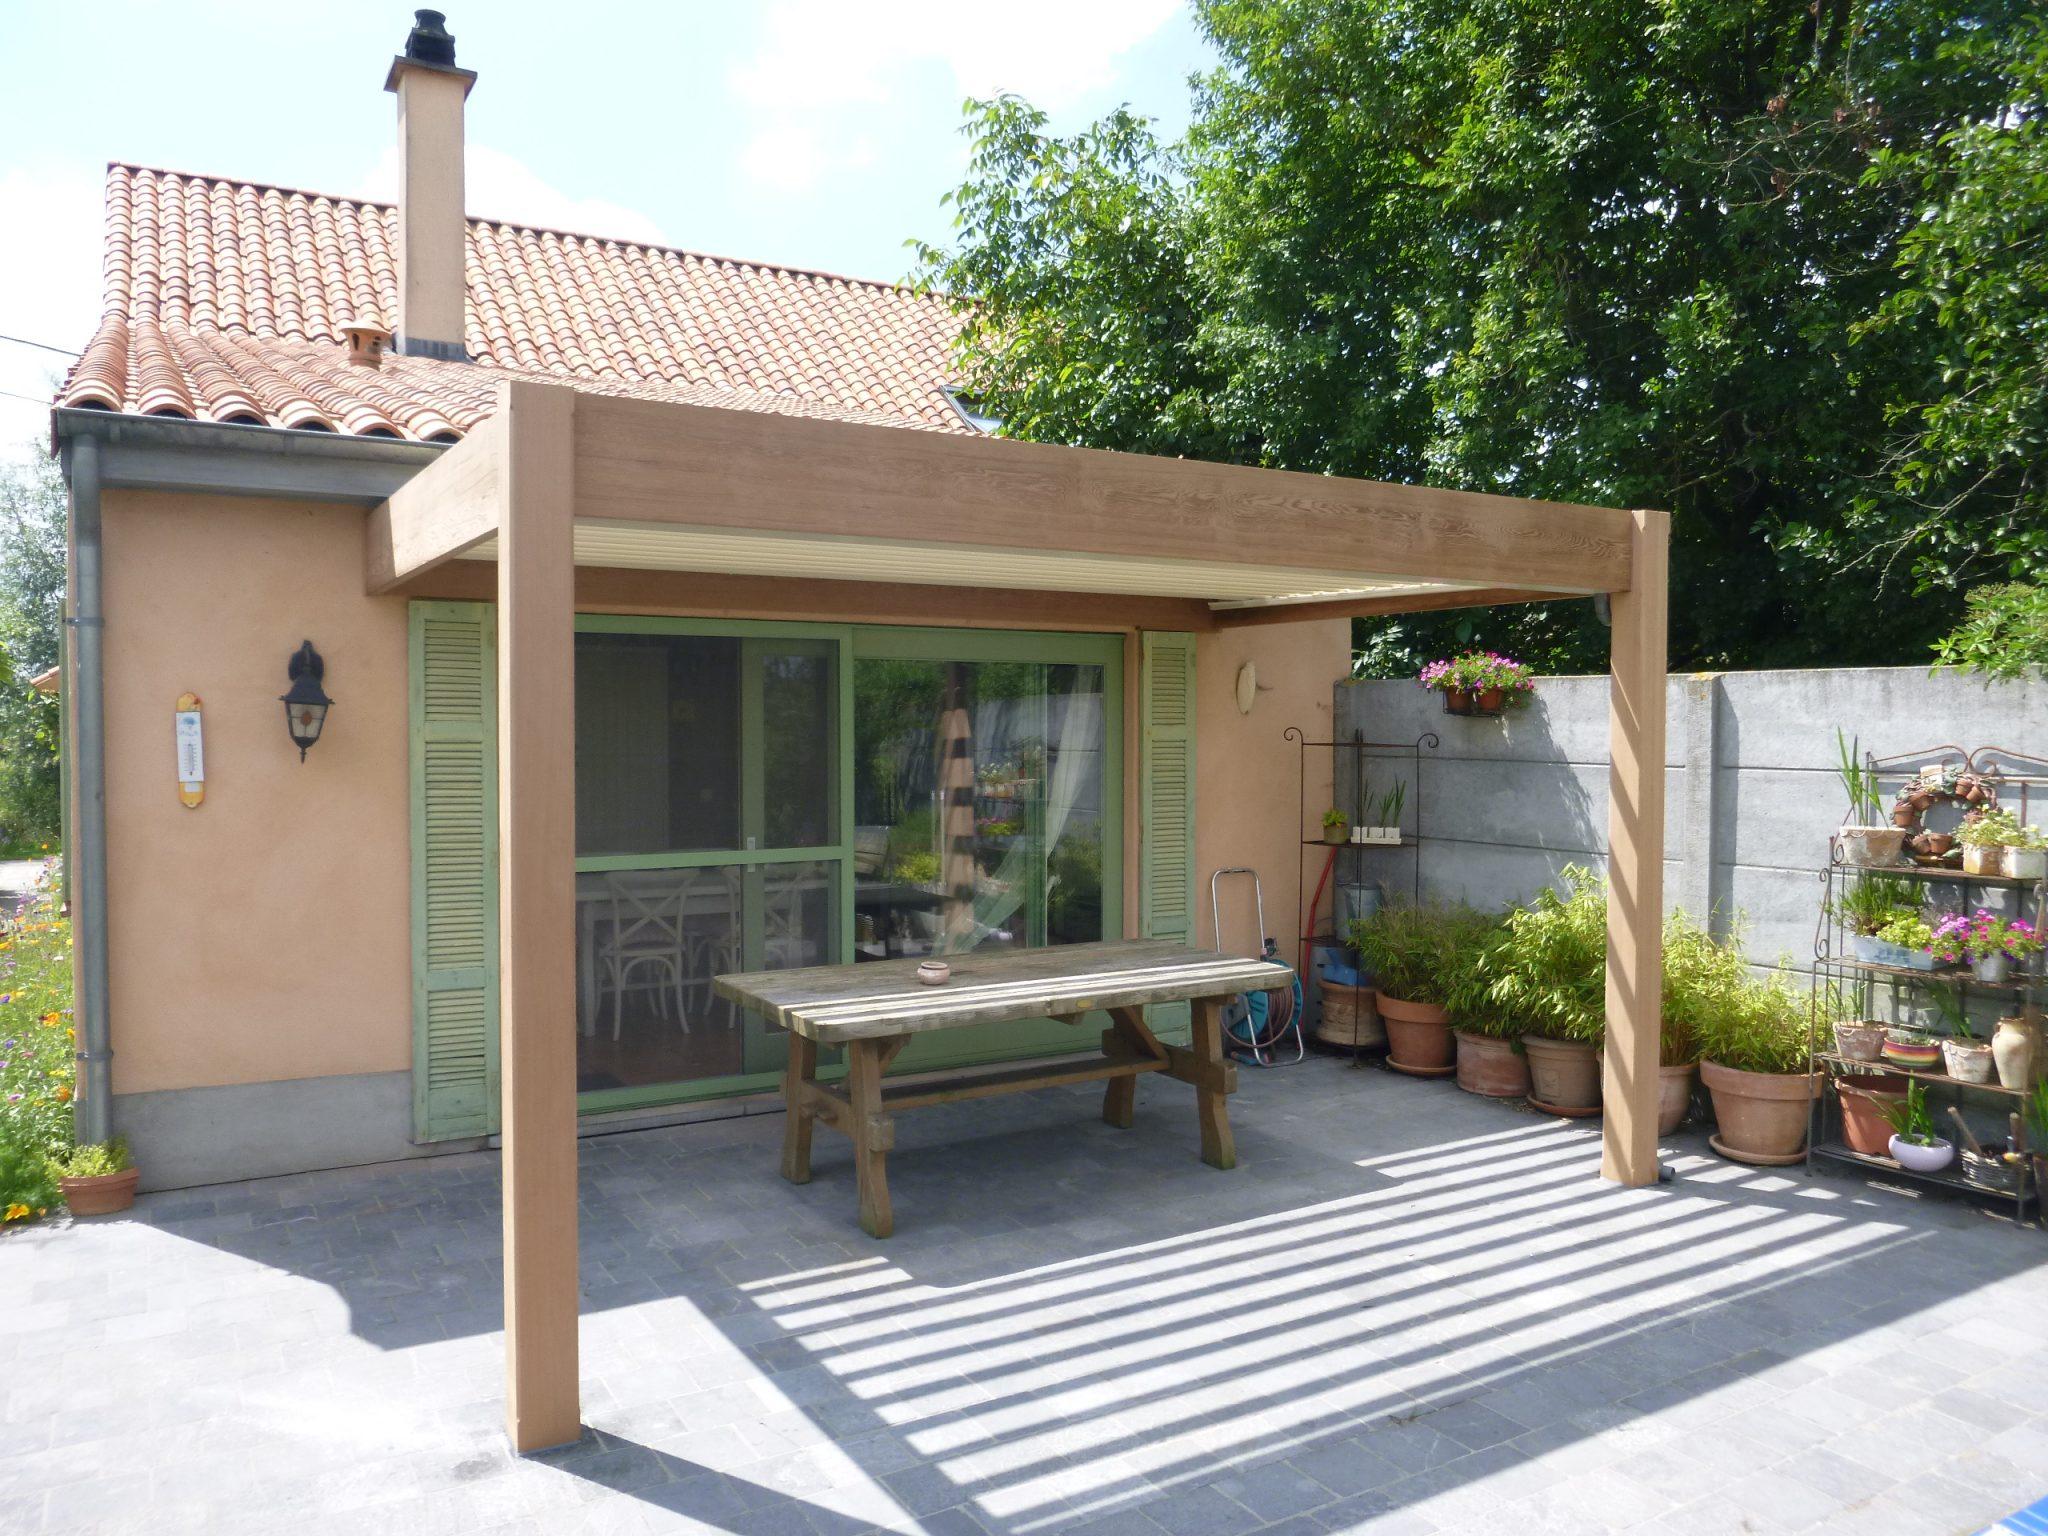 Css outdoor living pergola cederhout en aluminium - Pergola verkoop ...